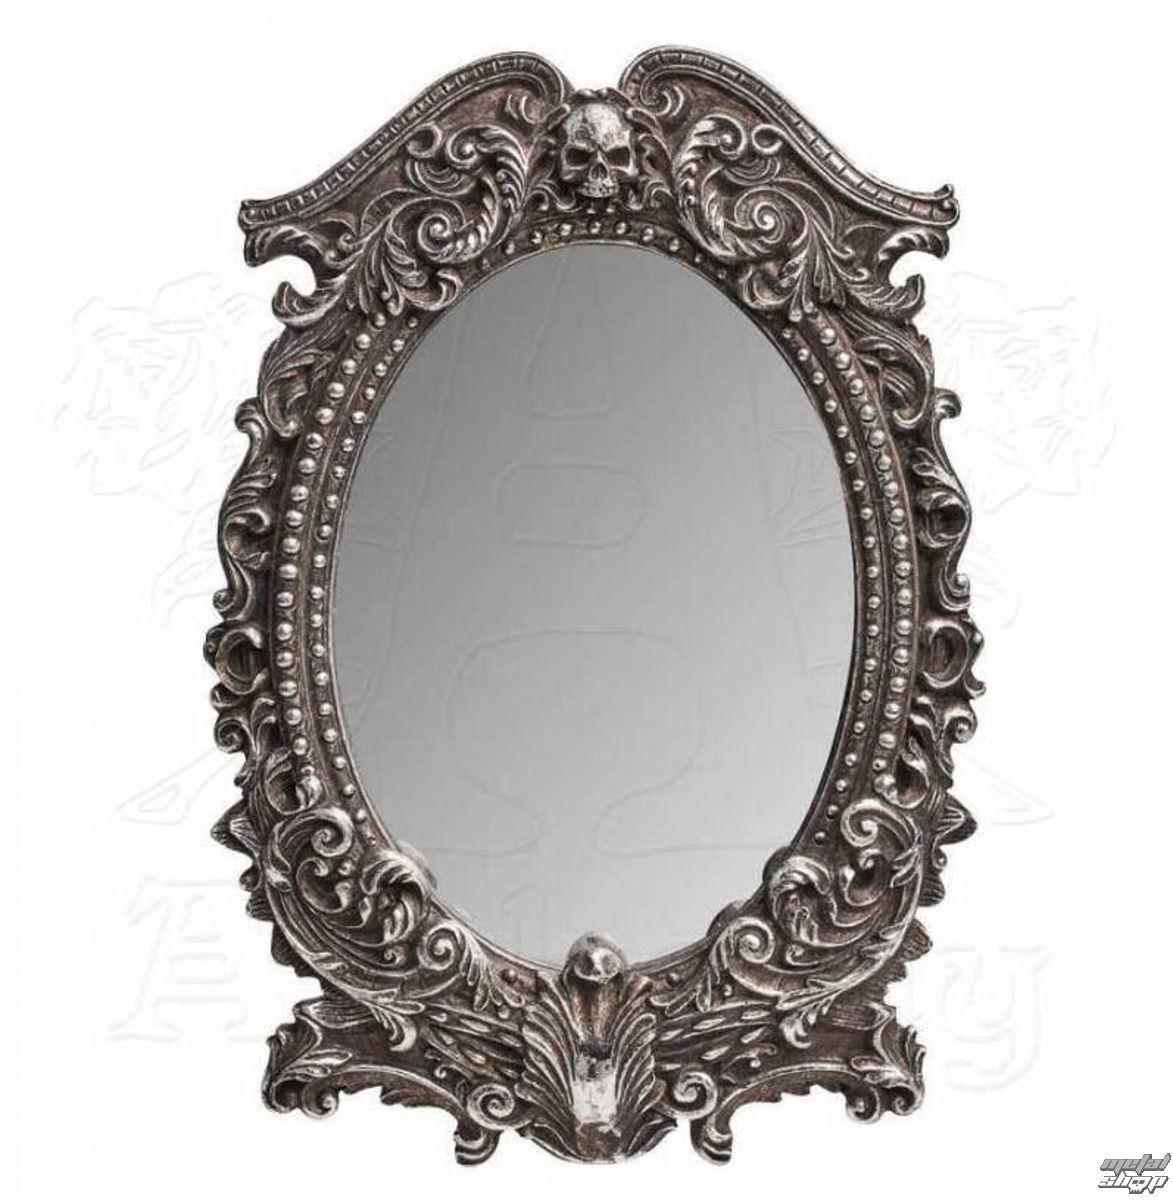 dekorácia (zrkadlo) ALCHEMY GOTHIC - Masque of the Rose - V54